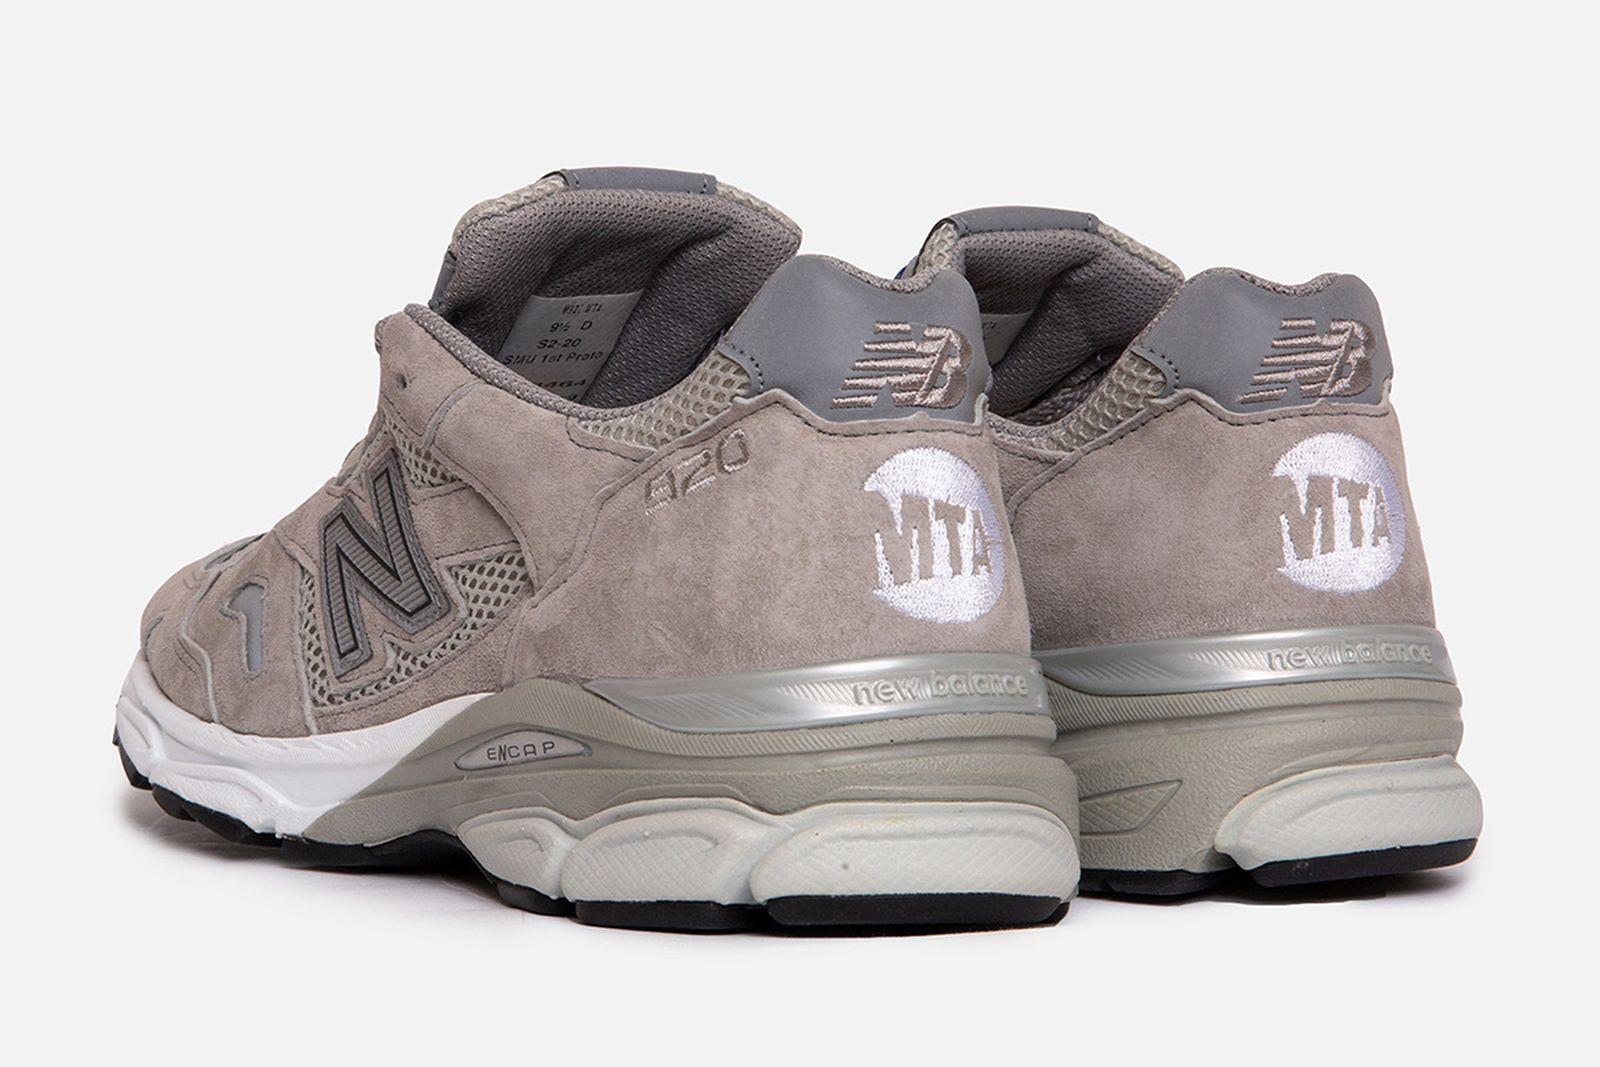 mta-new-balance-920-release-date-price-03